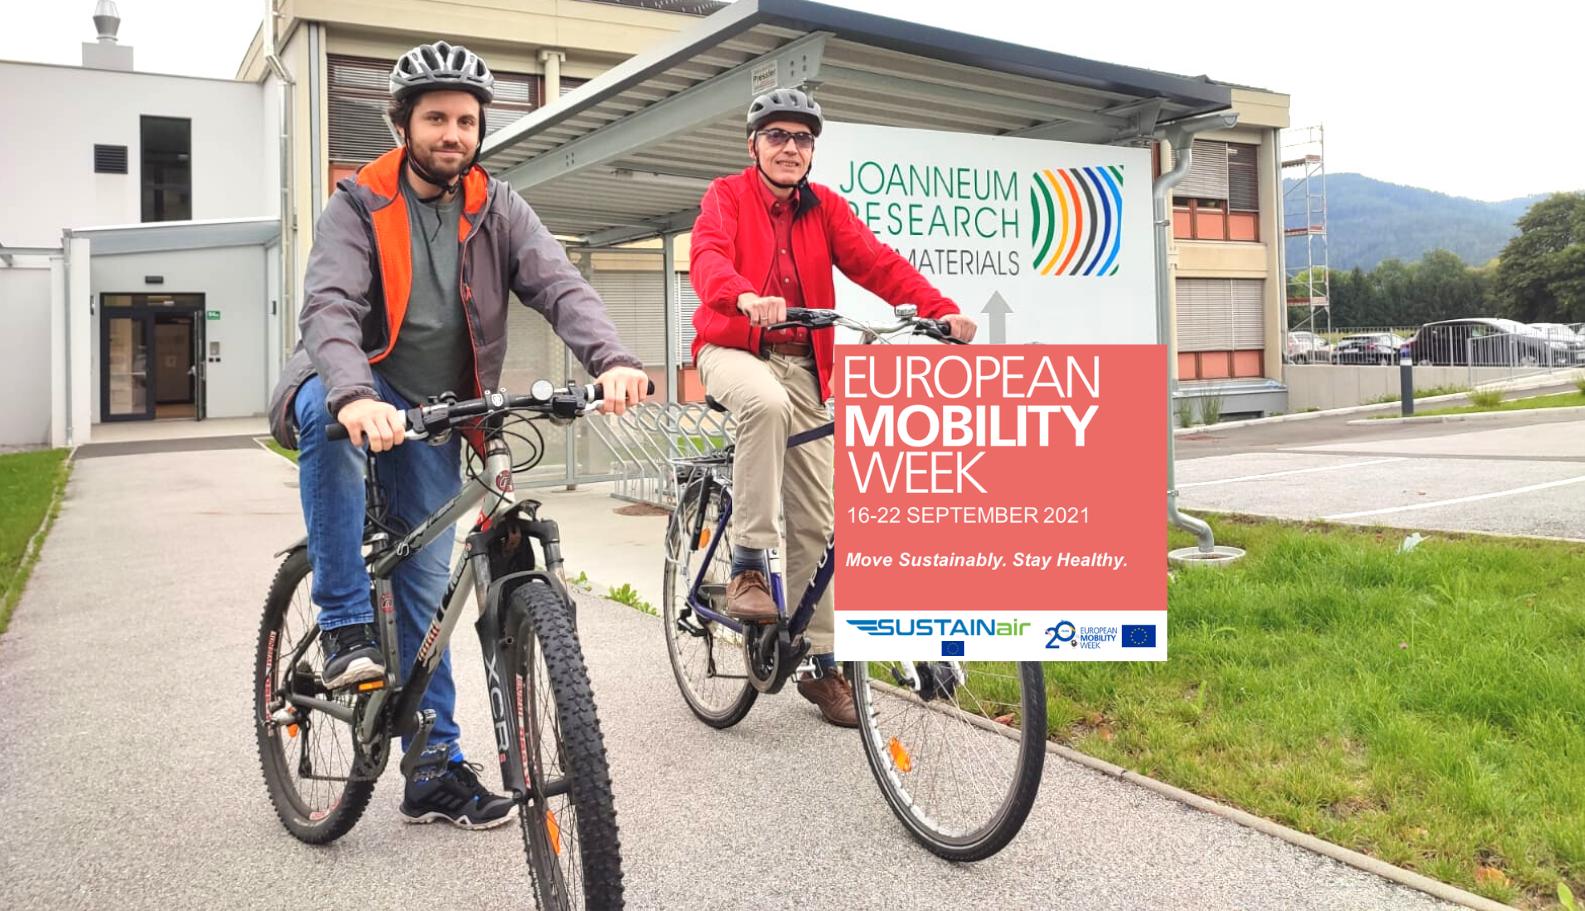 European Mobility Week 2021 JOANNEUM Research